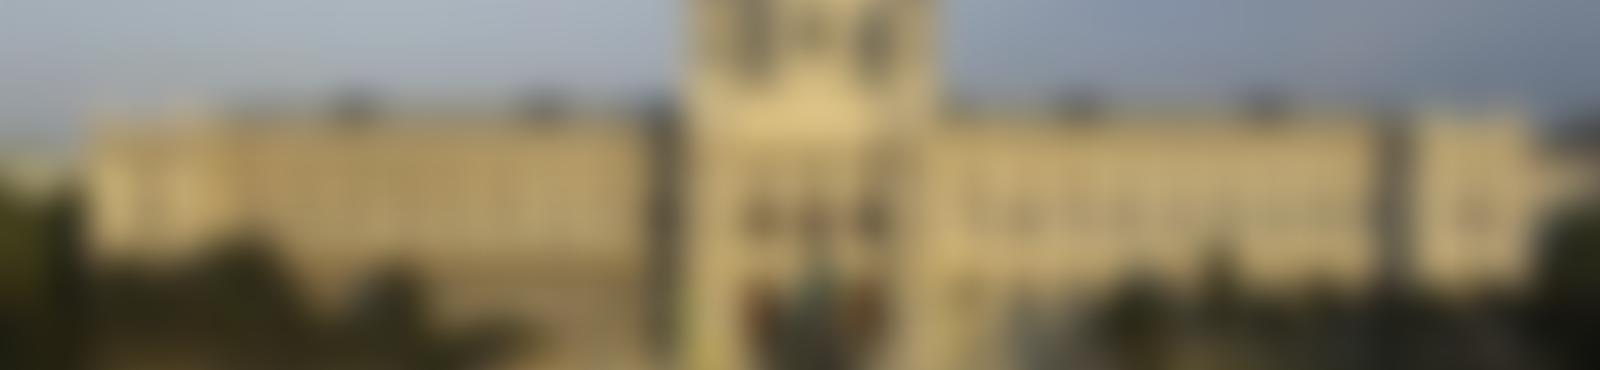 Blurred 9c423c6d b6cf 48bd 9184 1c7556f58448